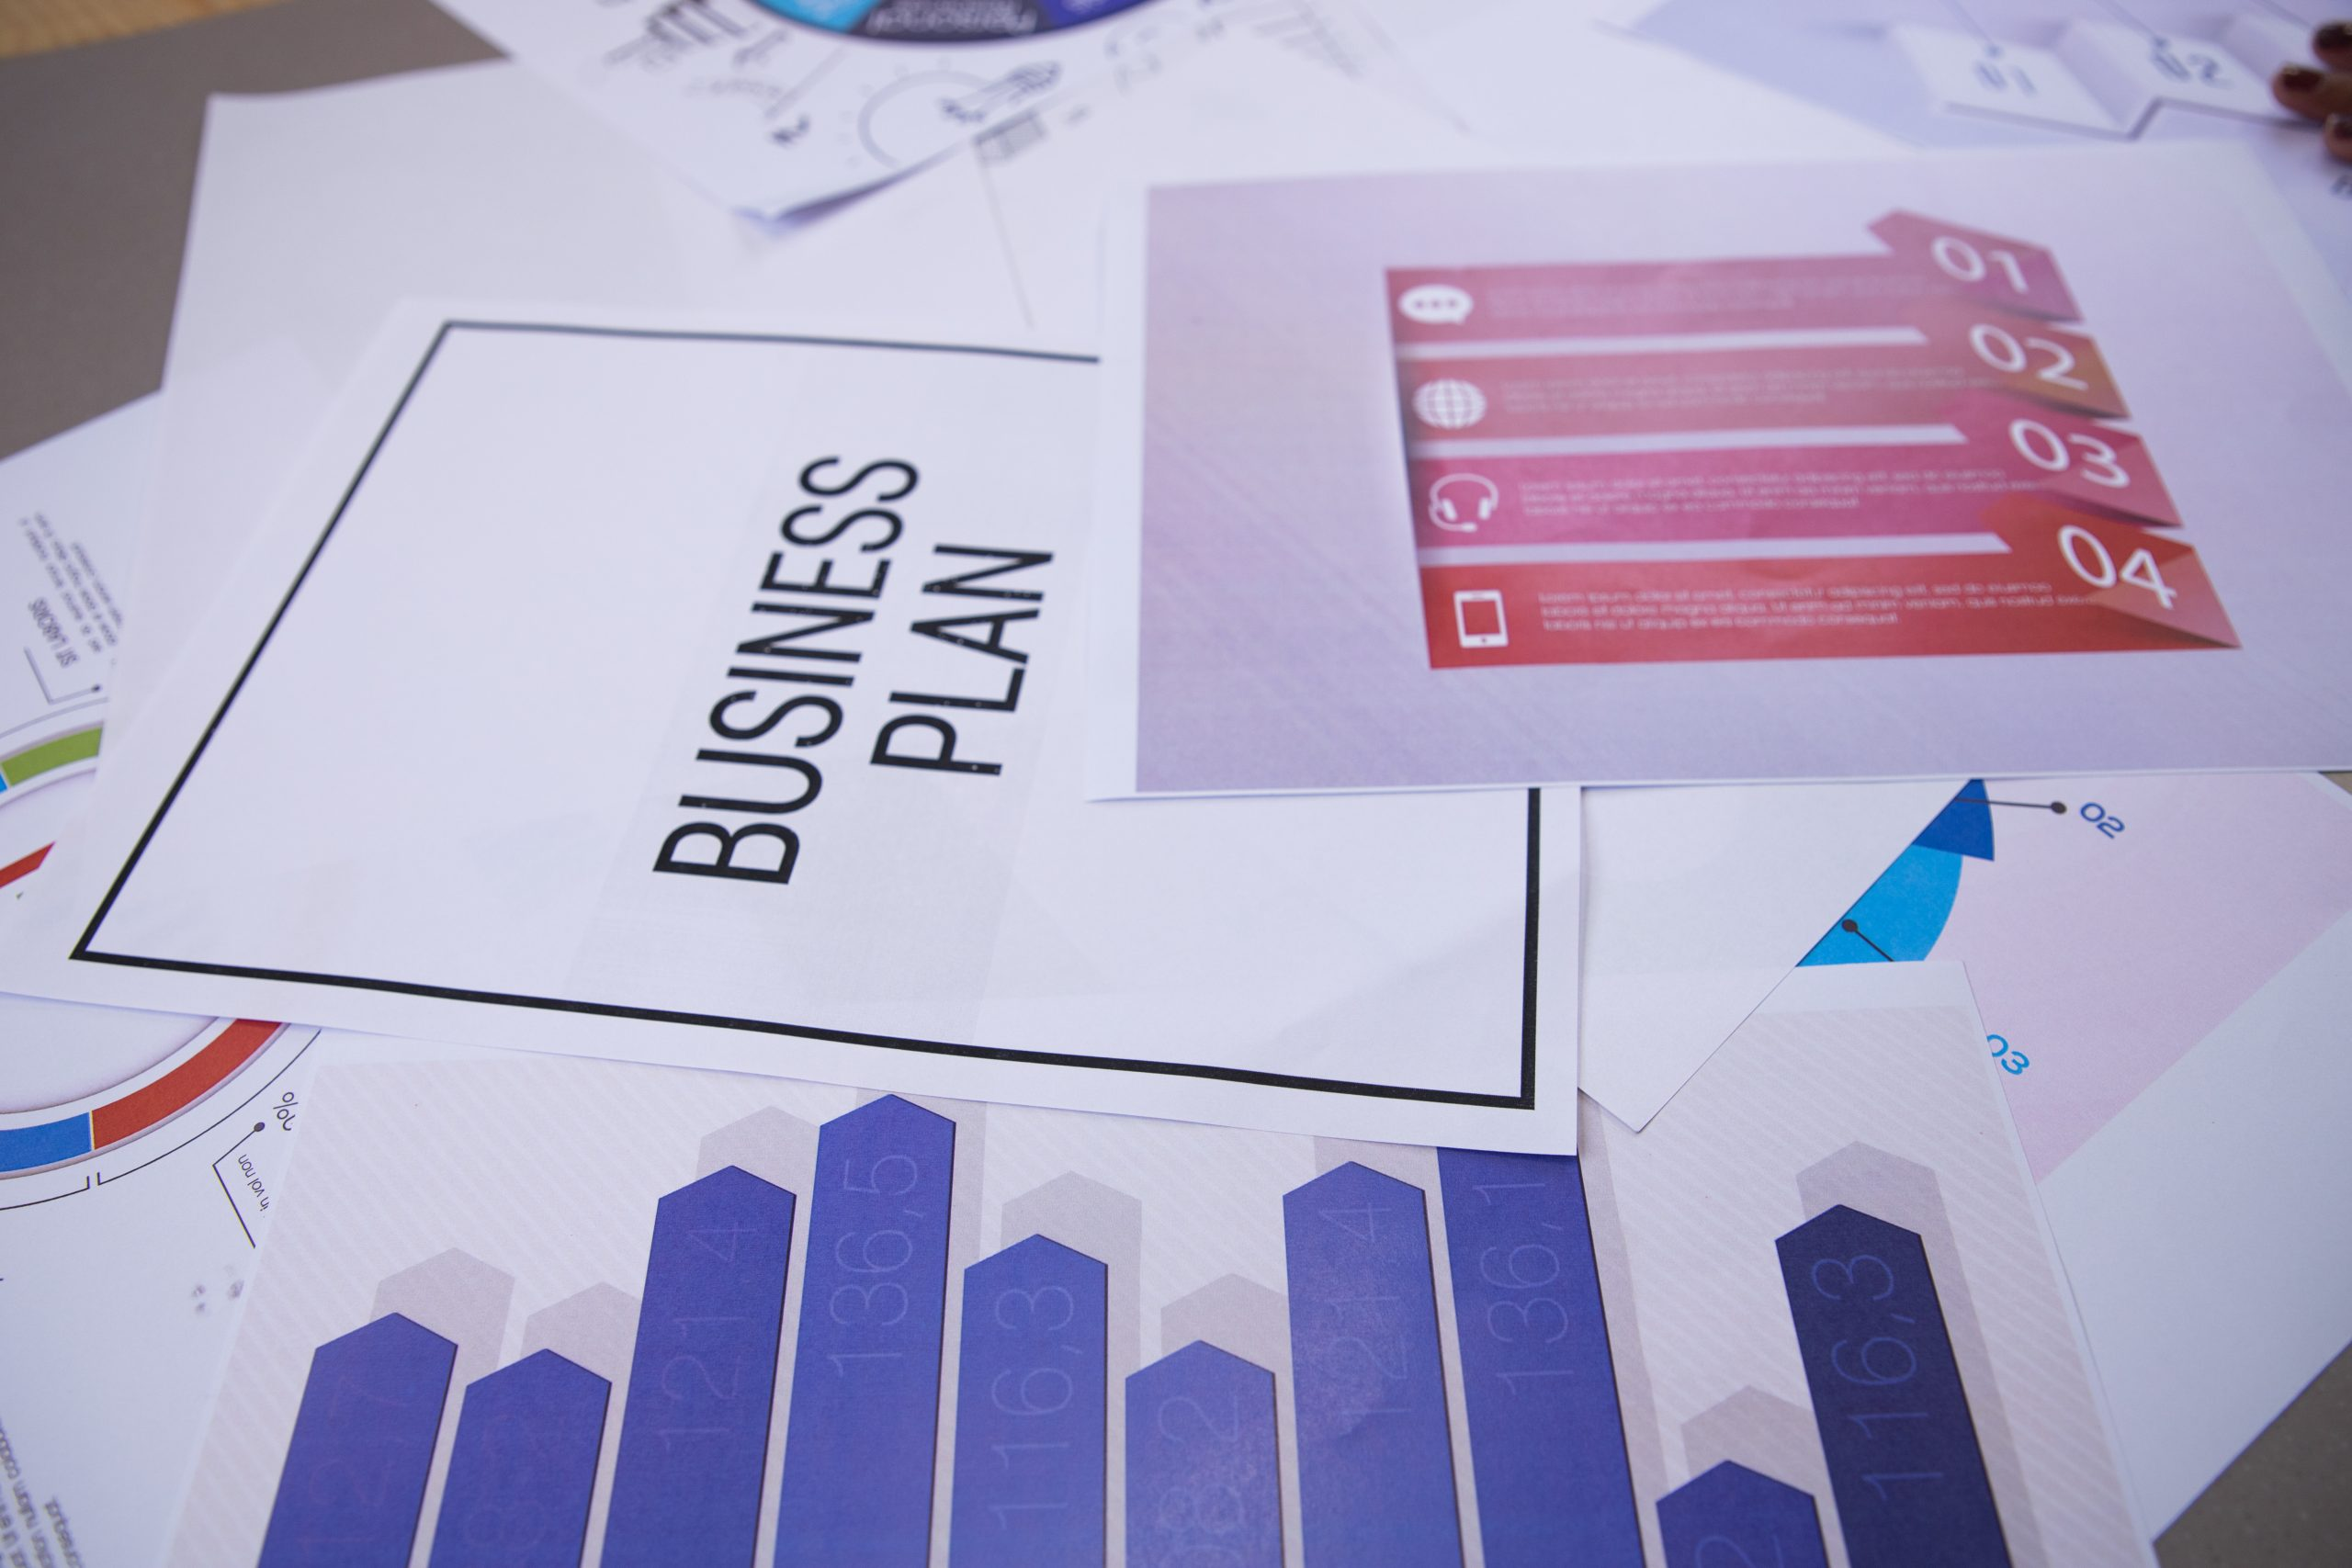 Analyzing business plan